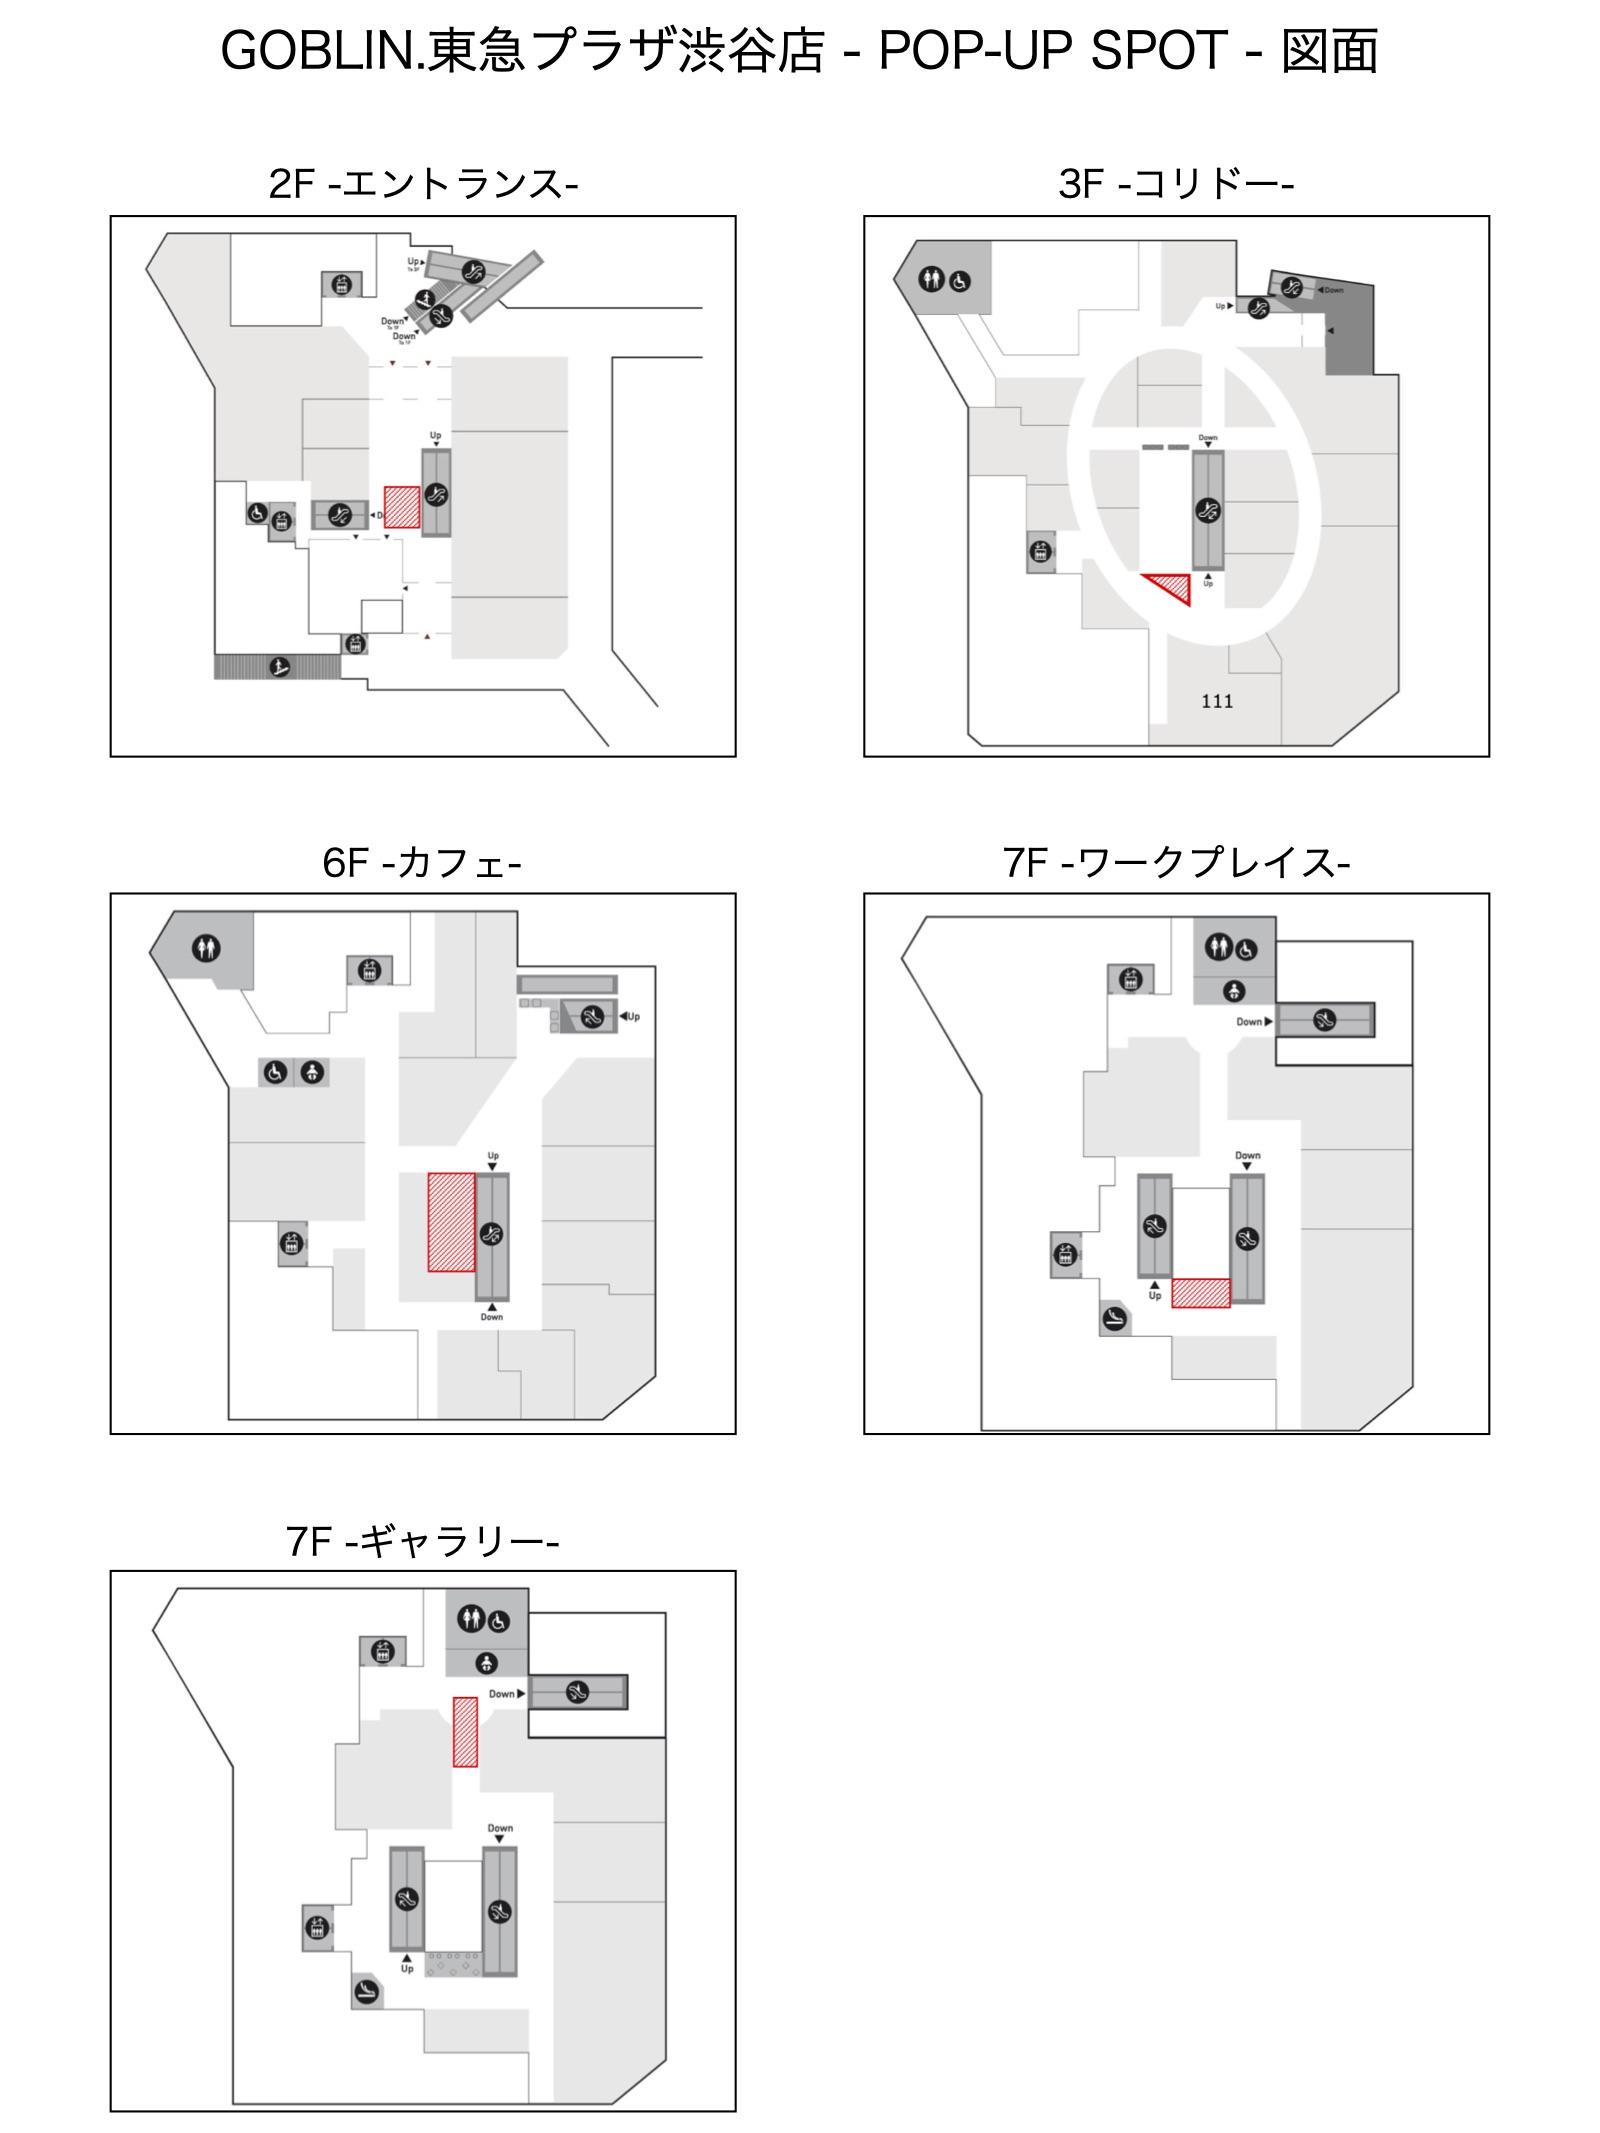 GOBLIN.東急プラザ渋谷店 -POP-UP SPOT-平面図